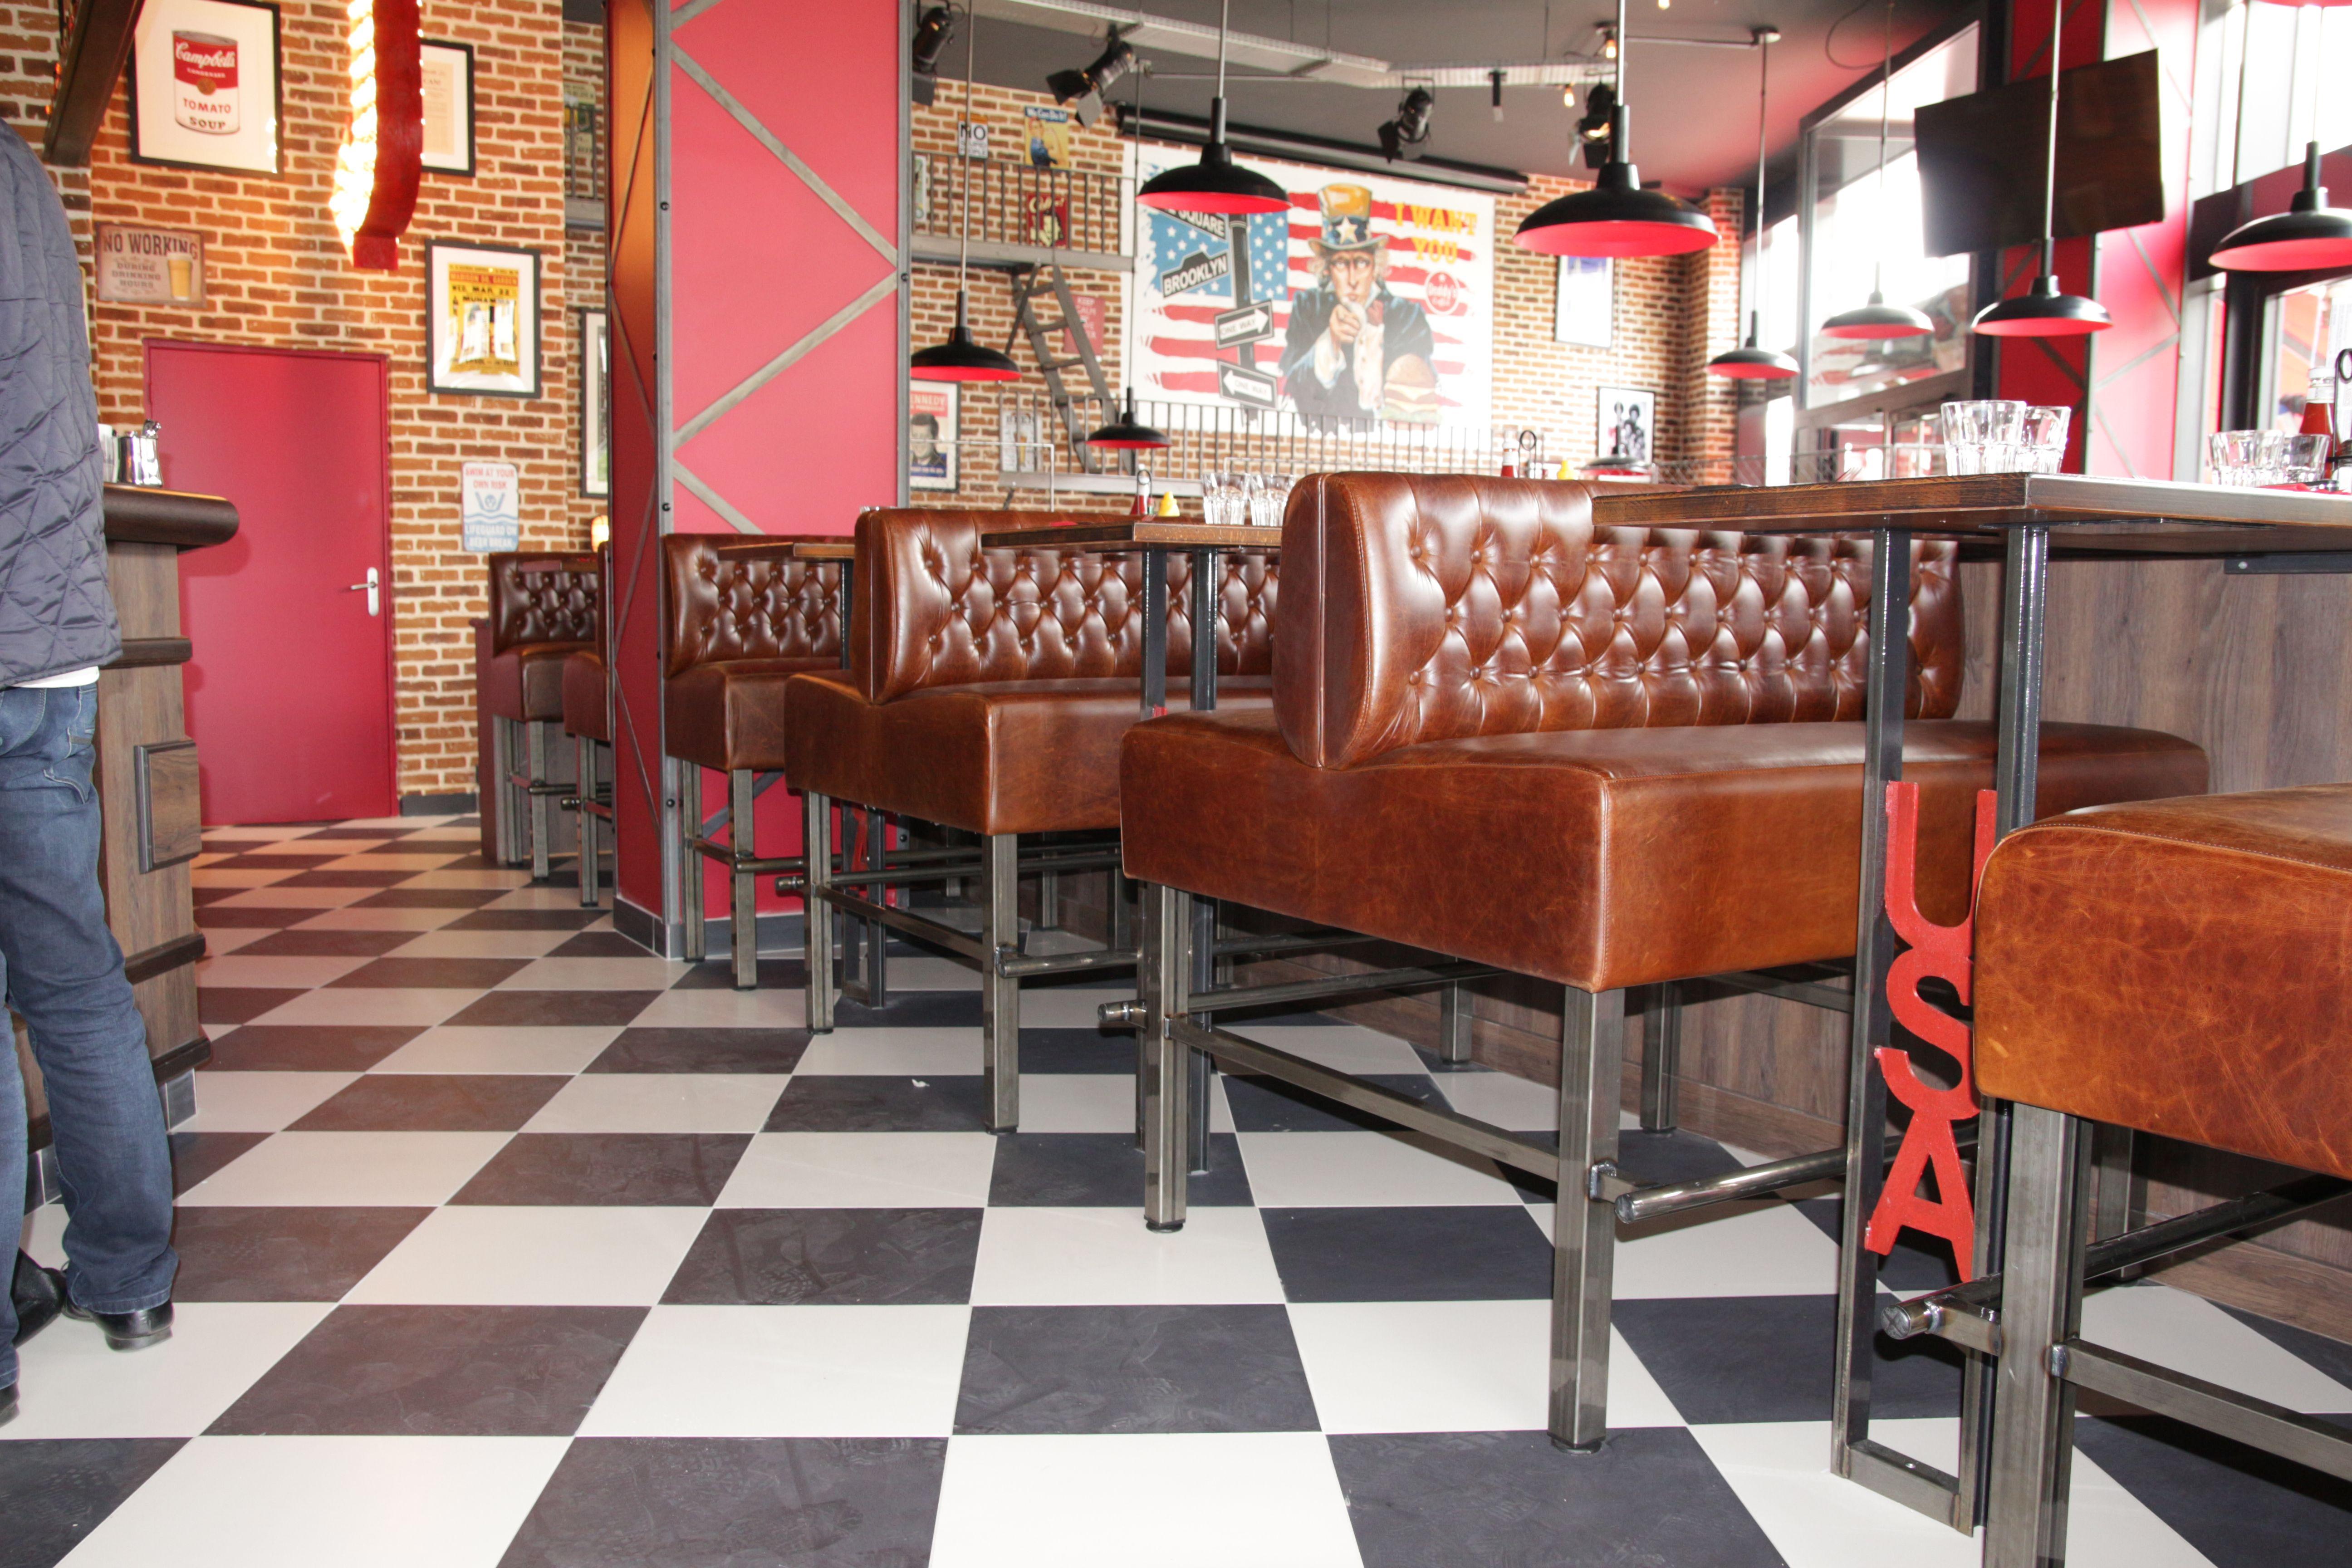 chaise restaurant design trendy explore helsinki finlandia commercial interiors and more. Black Bedroom Furniture Sets. Home Design Ideas